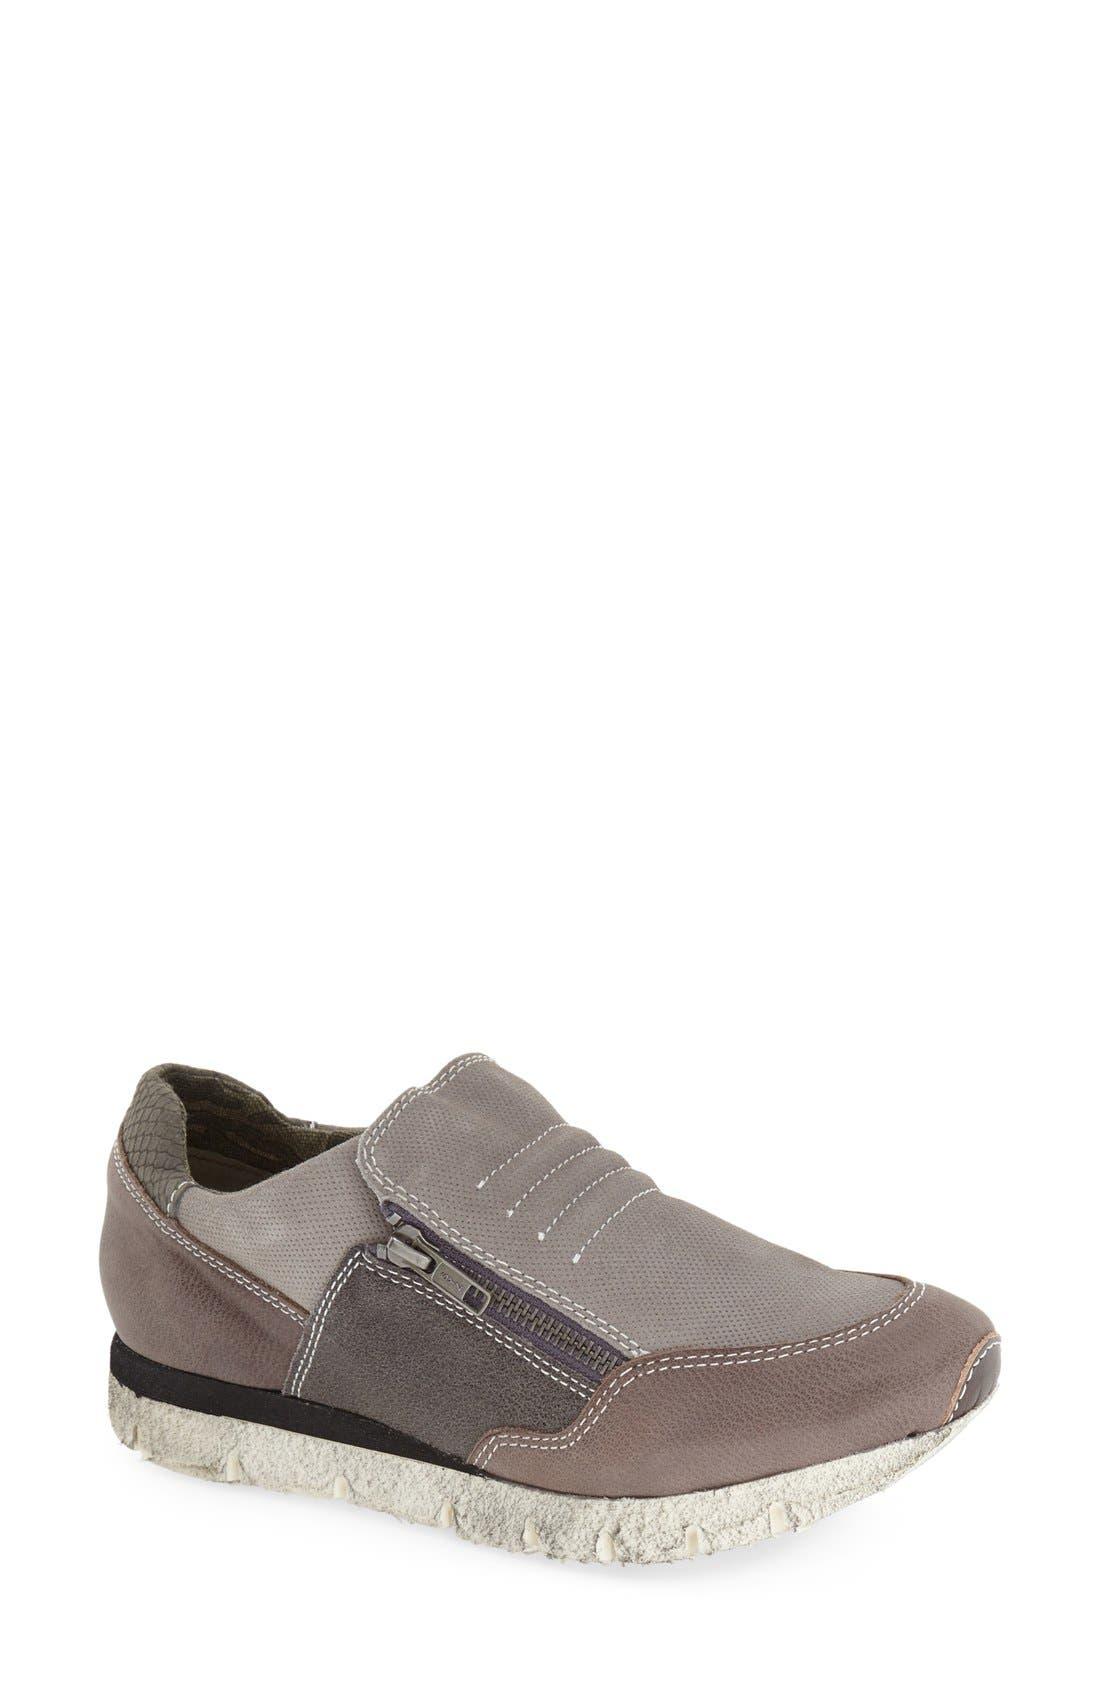 Alternate Image 1 Selected - OTBT'Sewell' Sneaker (Women)